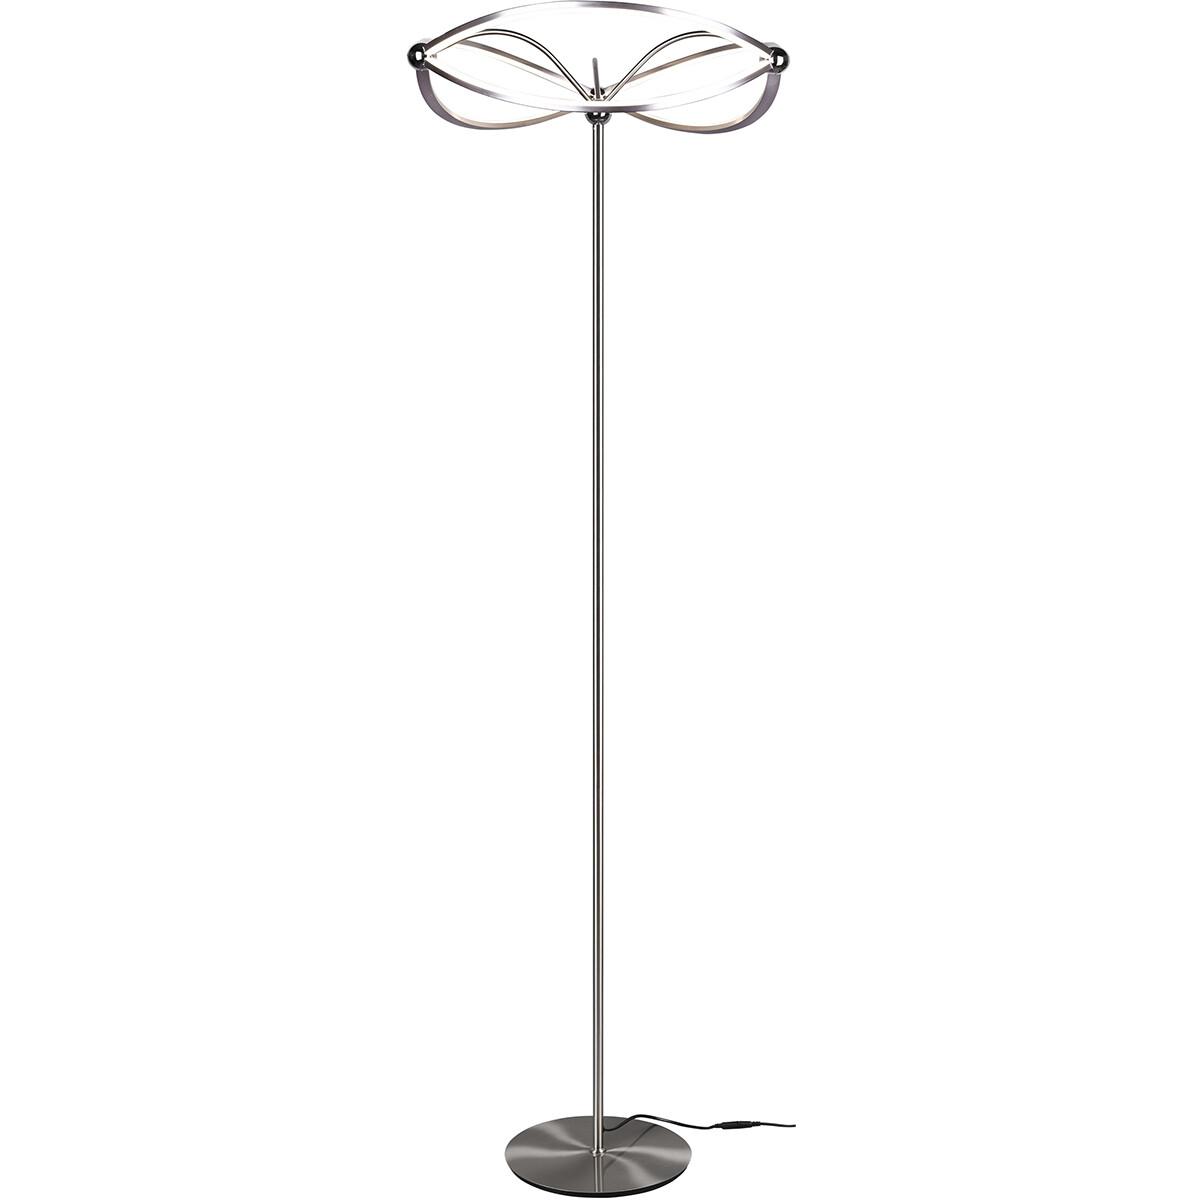 LED Vloerlamp - Trion Charis - 31W - Warm Wit 3000K - Dimbaar - Rond - Mat Nikkel - Aluminium